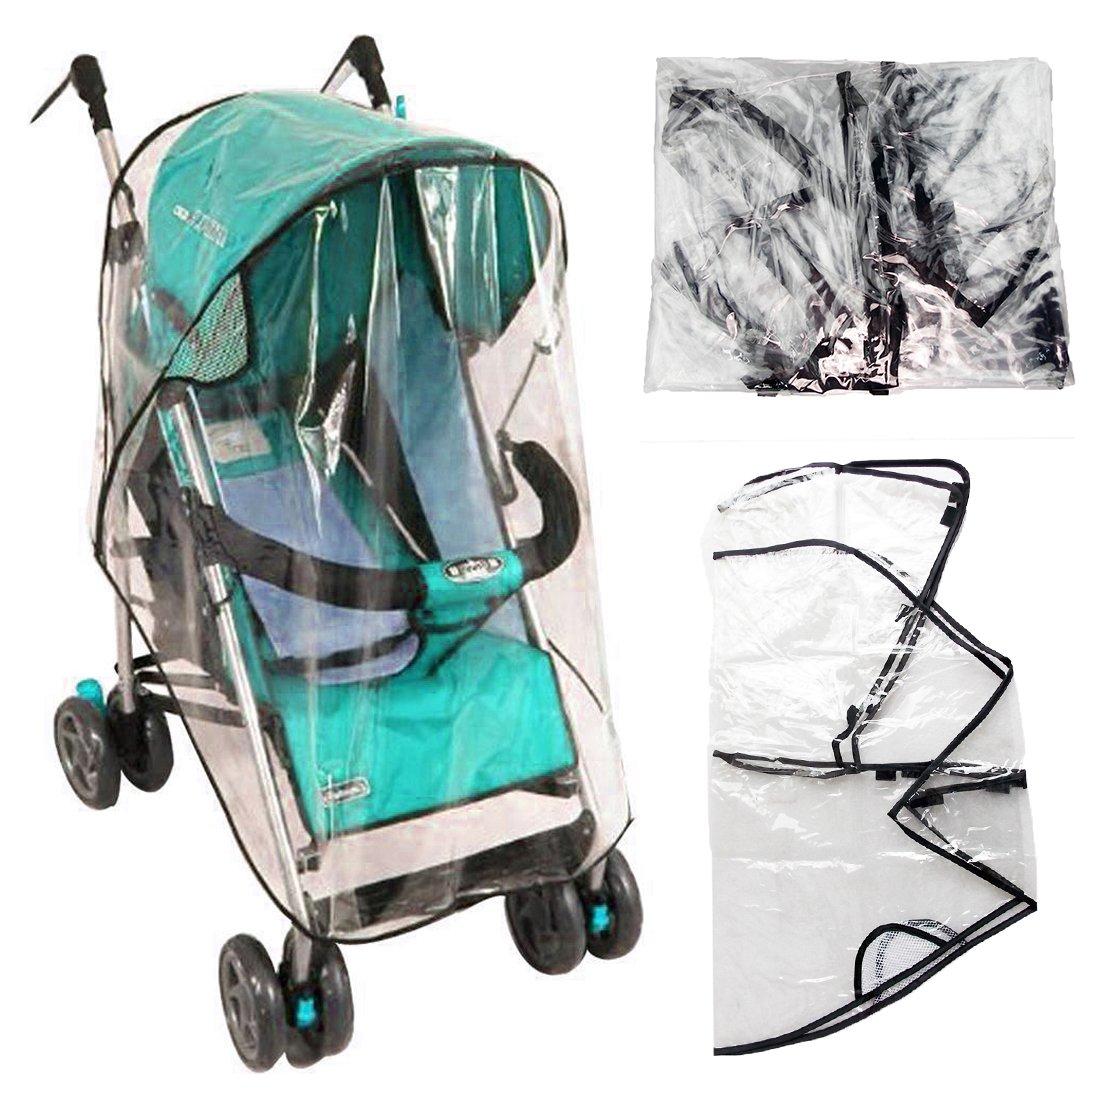 JJPRIME - Universal Clear Buggy Pram Pushchair Stroller Transparent Rain Wind Cover Baby Toddler Travel Shopping Park (77 x 47 x 57cm)